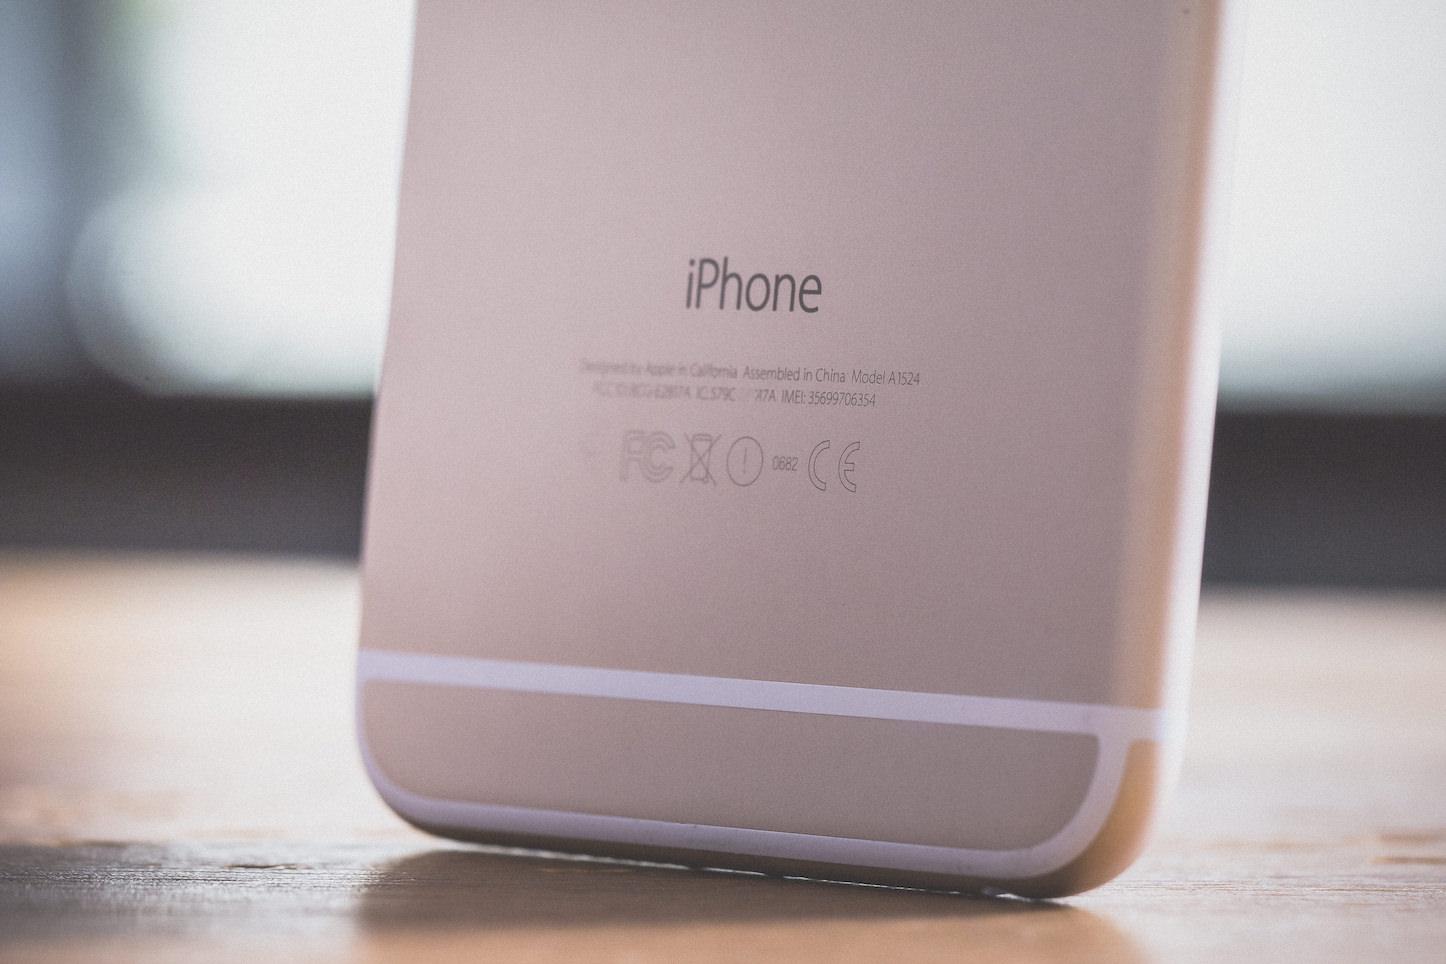 iphone-6-plus-back-panel.jpg